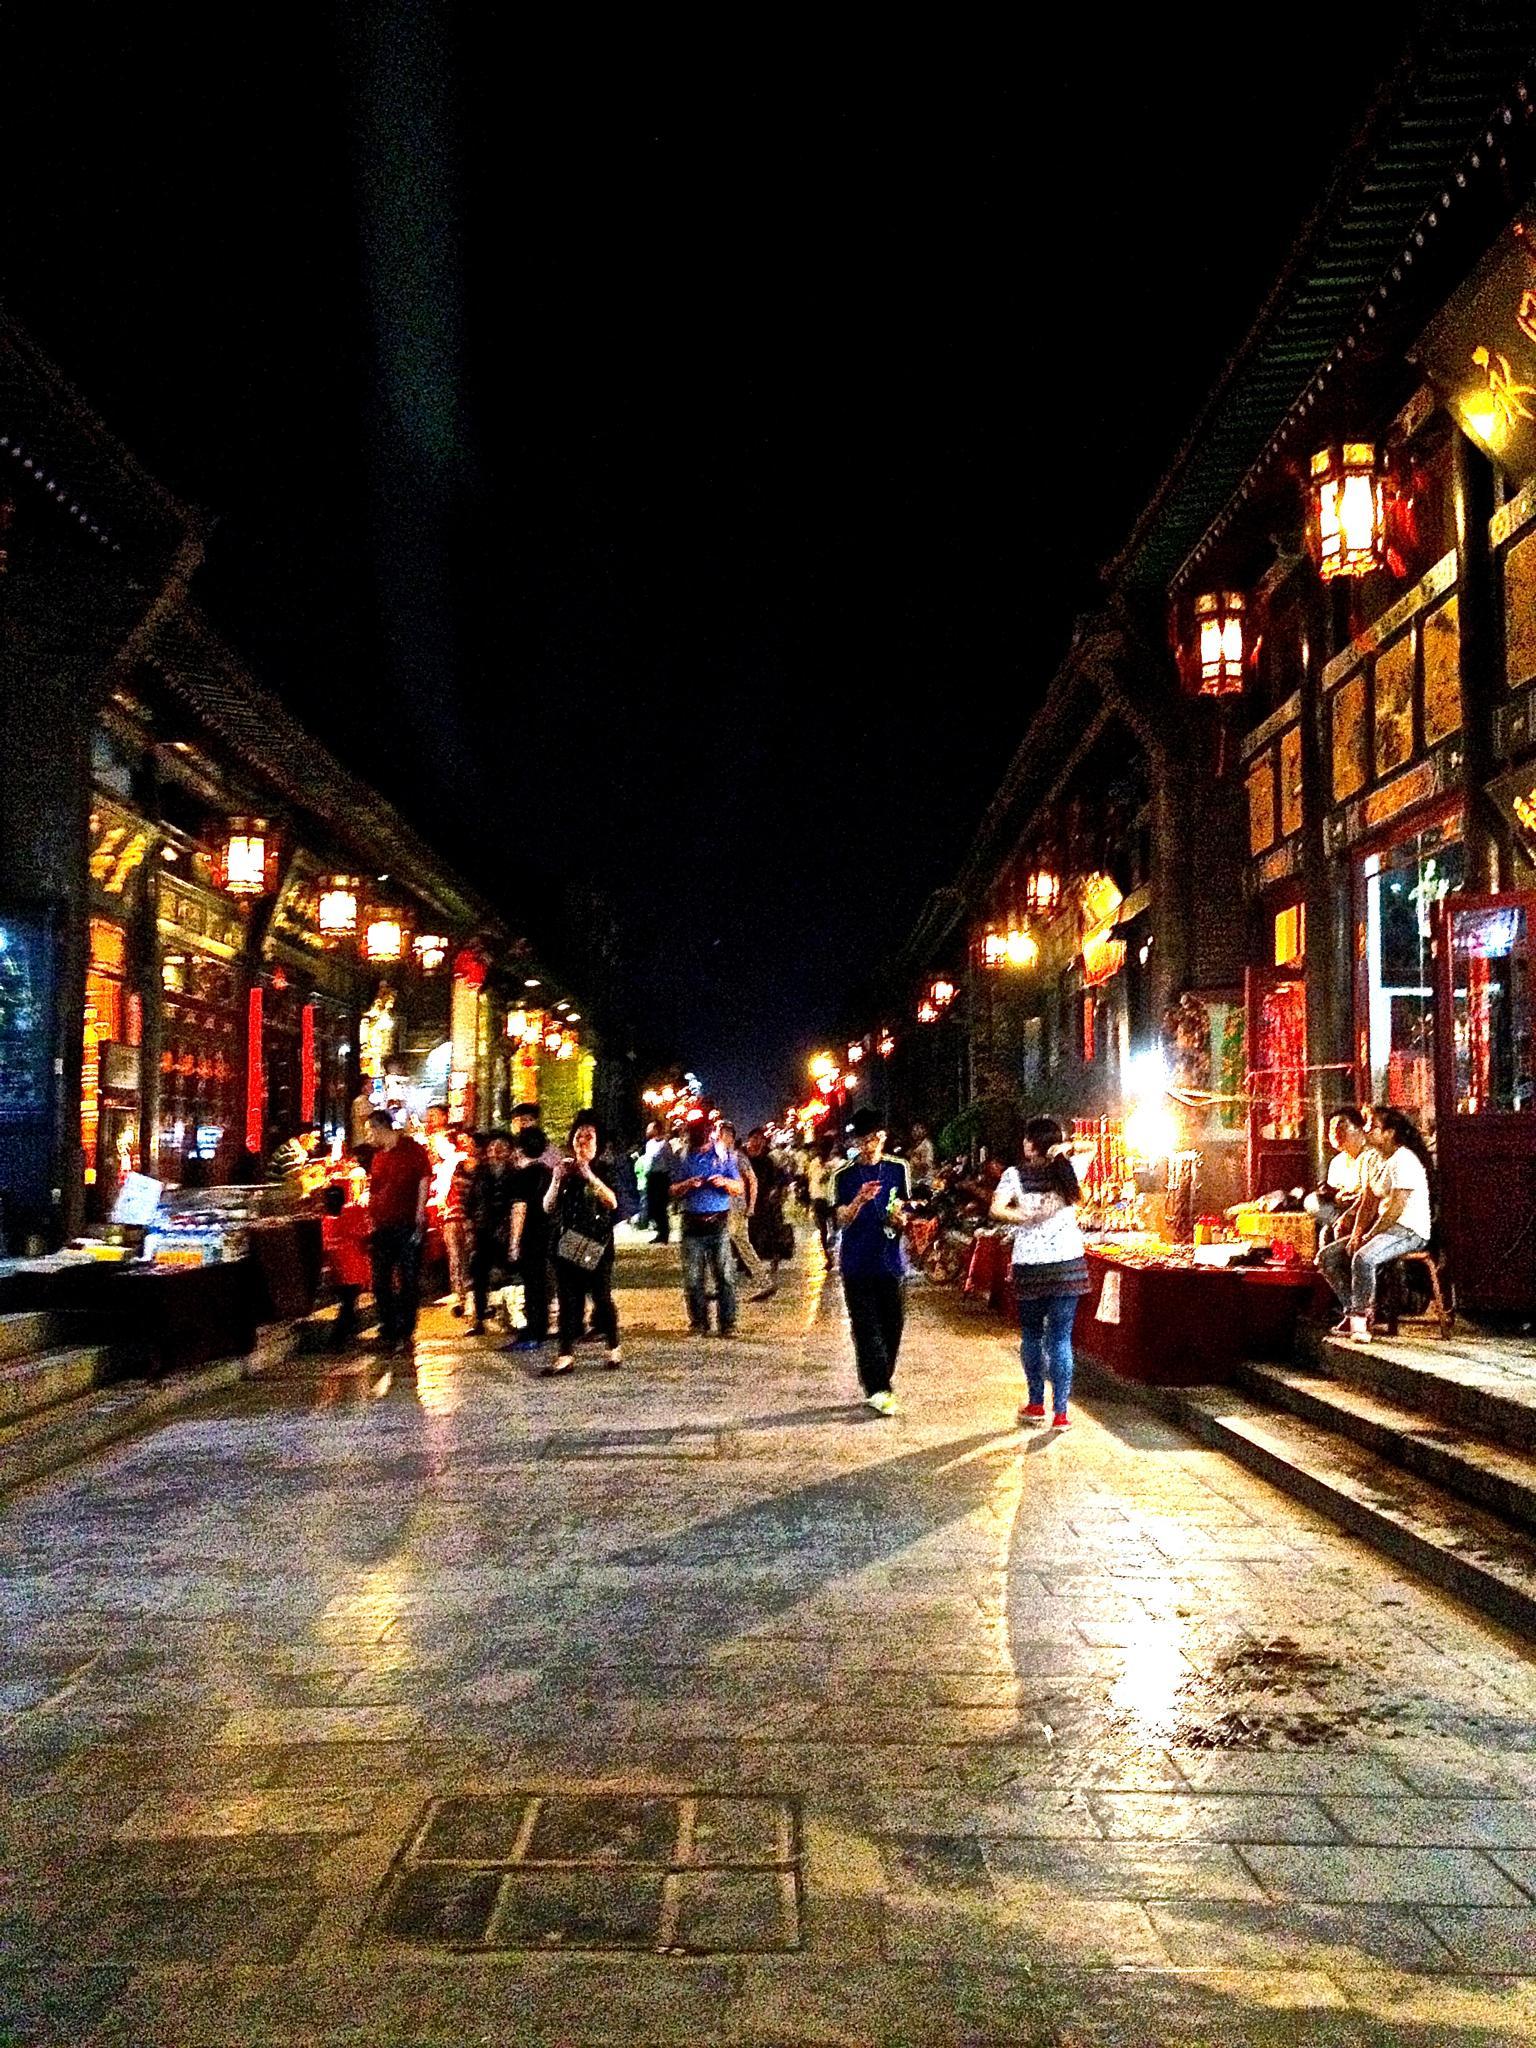 Streets At Night by Vivian